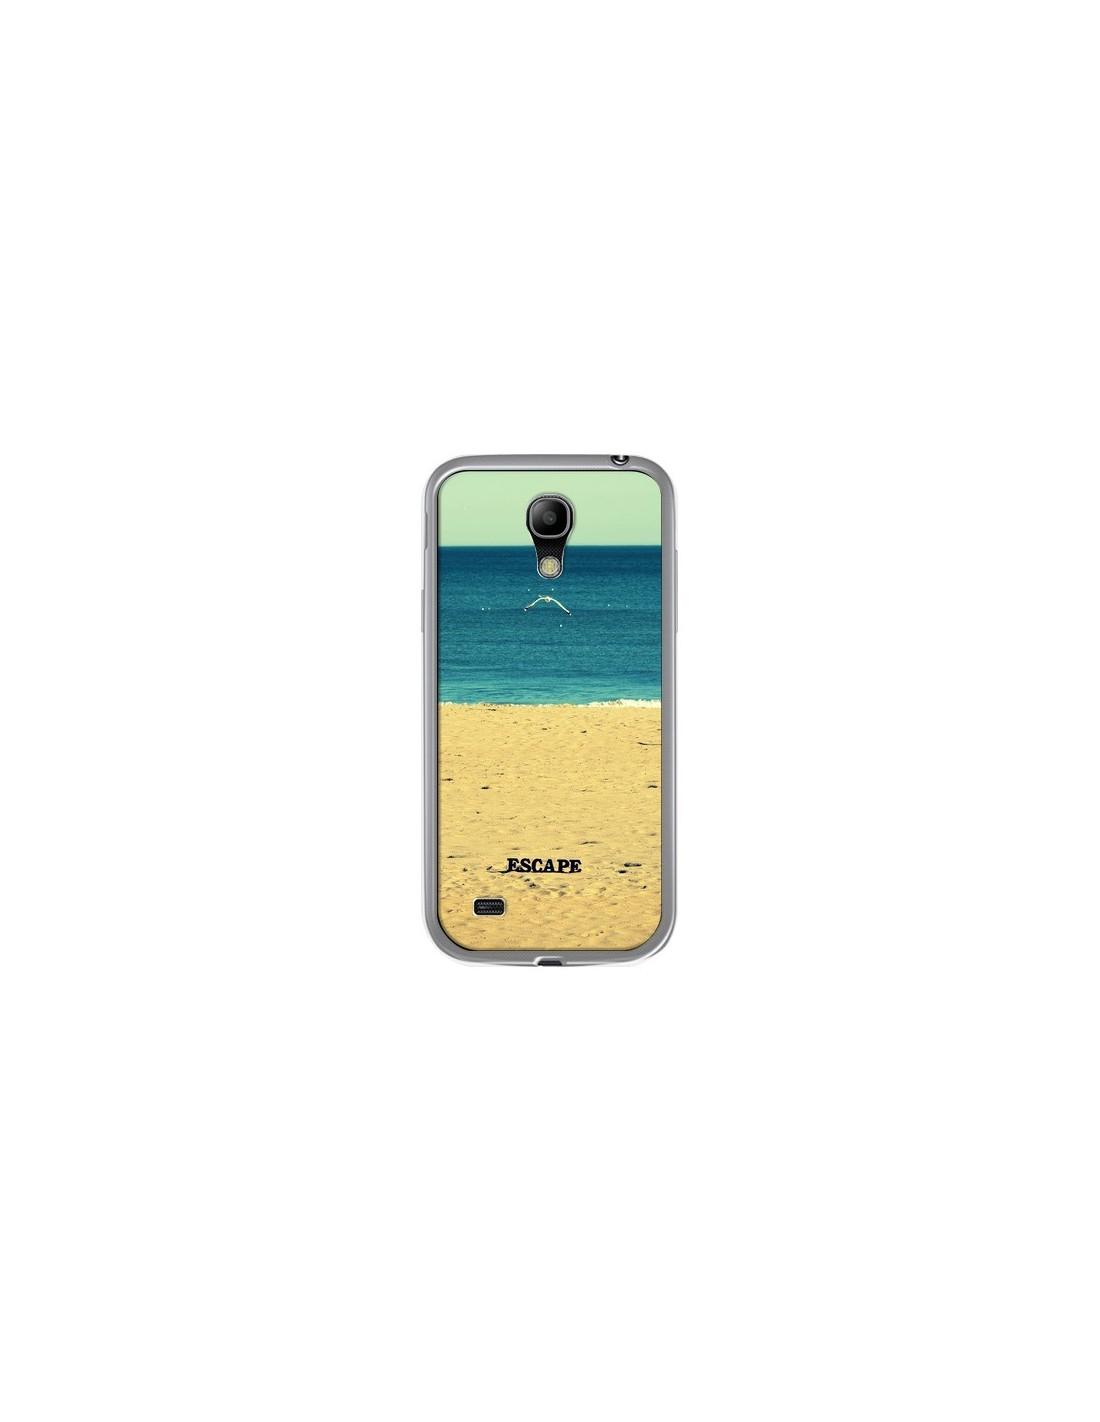 coque escape mer plage ocean sable paysage pour samsung galaxy s4 mini r delean. Black Bedroom Furniture Sets. Home Design Ideas